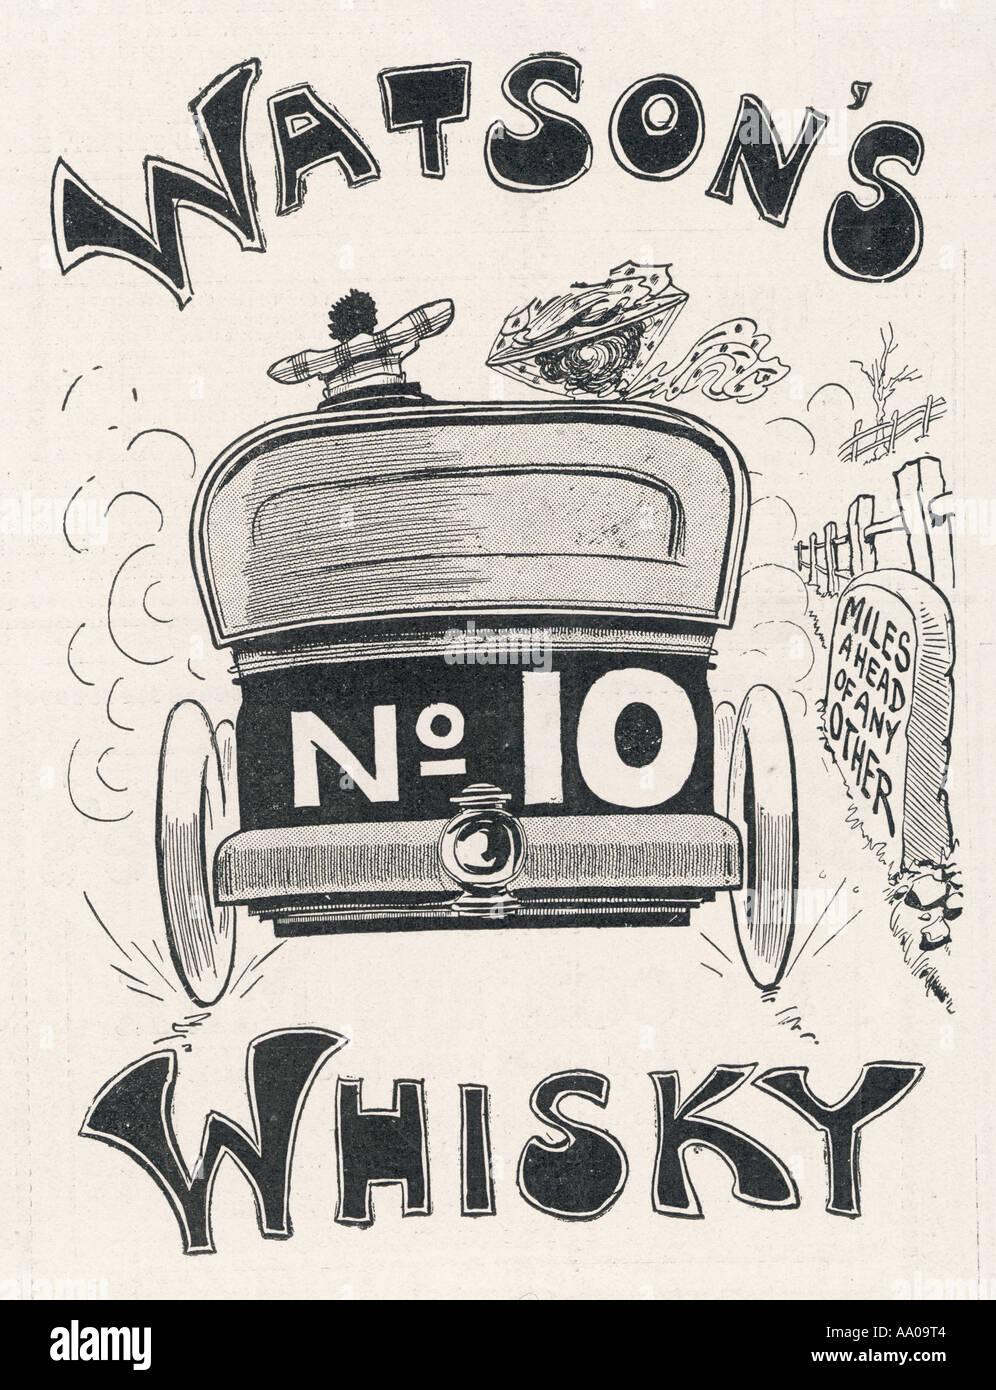 Watsons Whisky 1905 - Stock Image